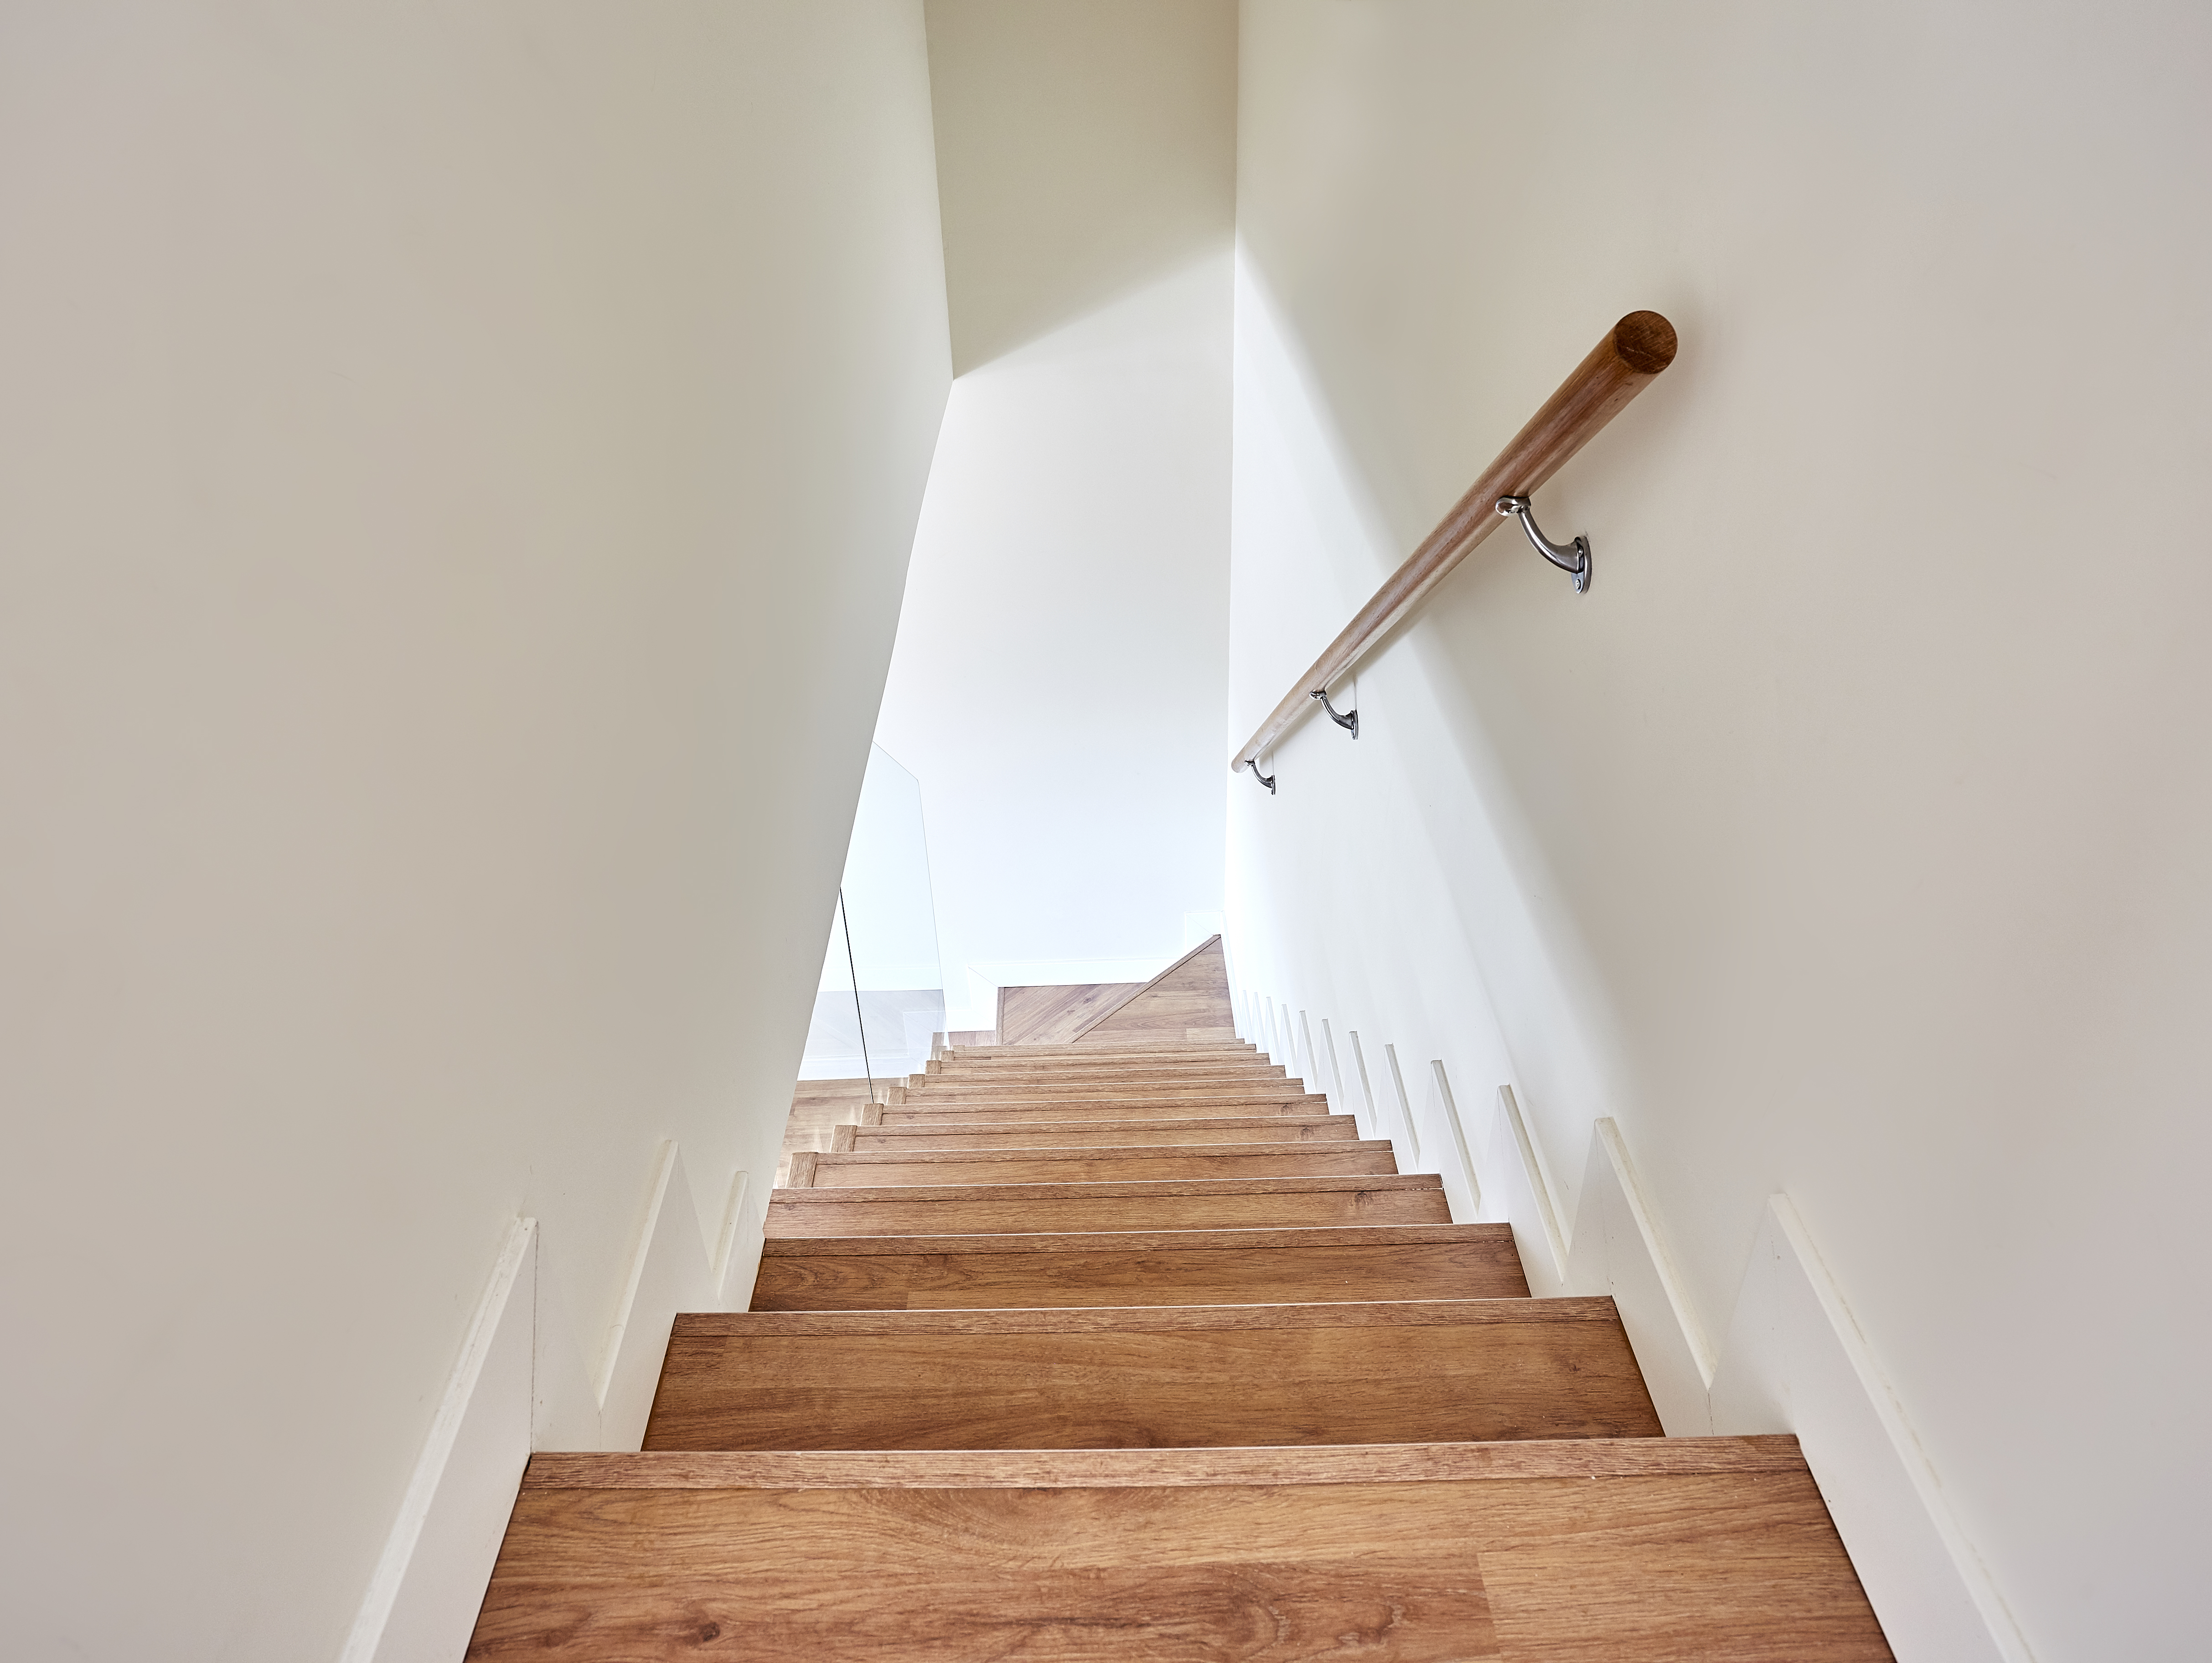 Vista Segundo Tramo Bajada Escalera